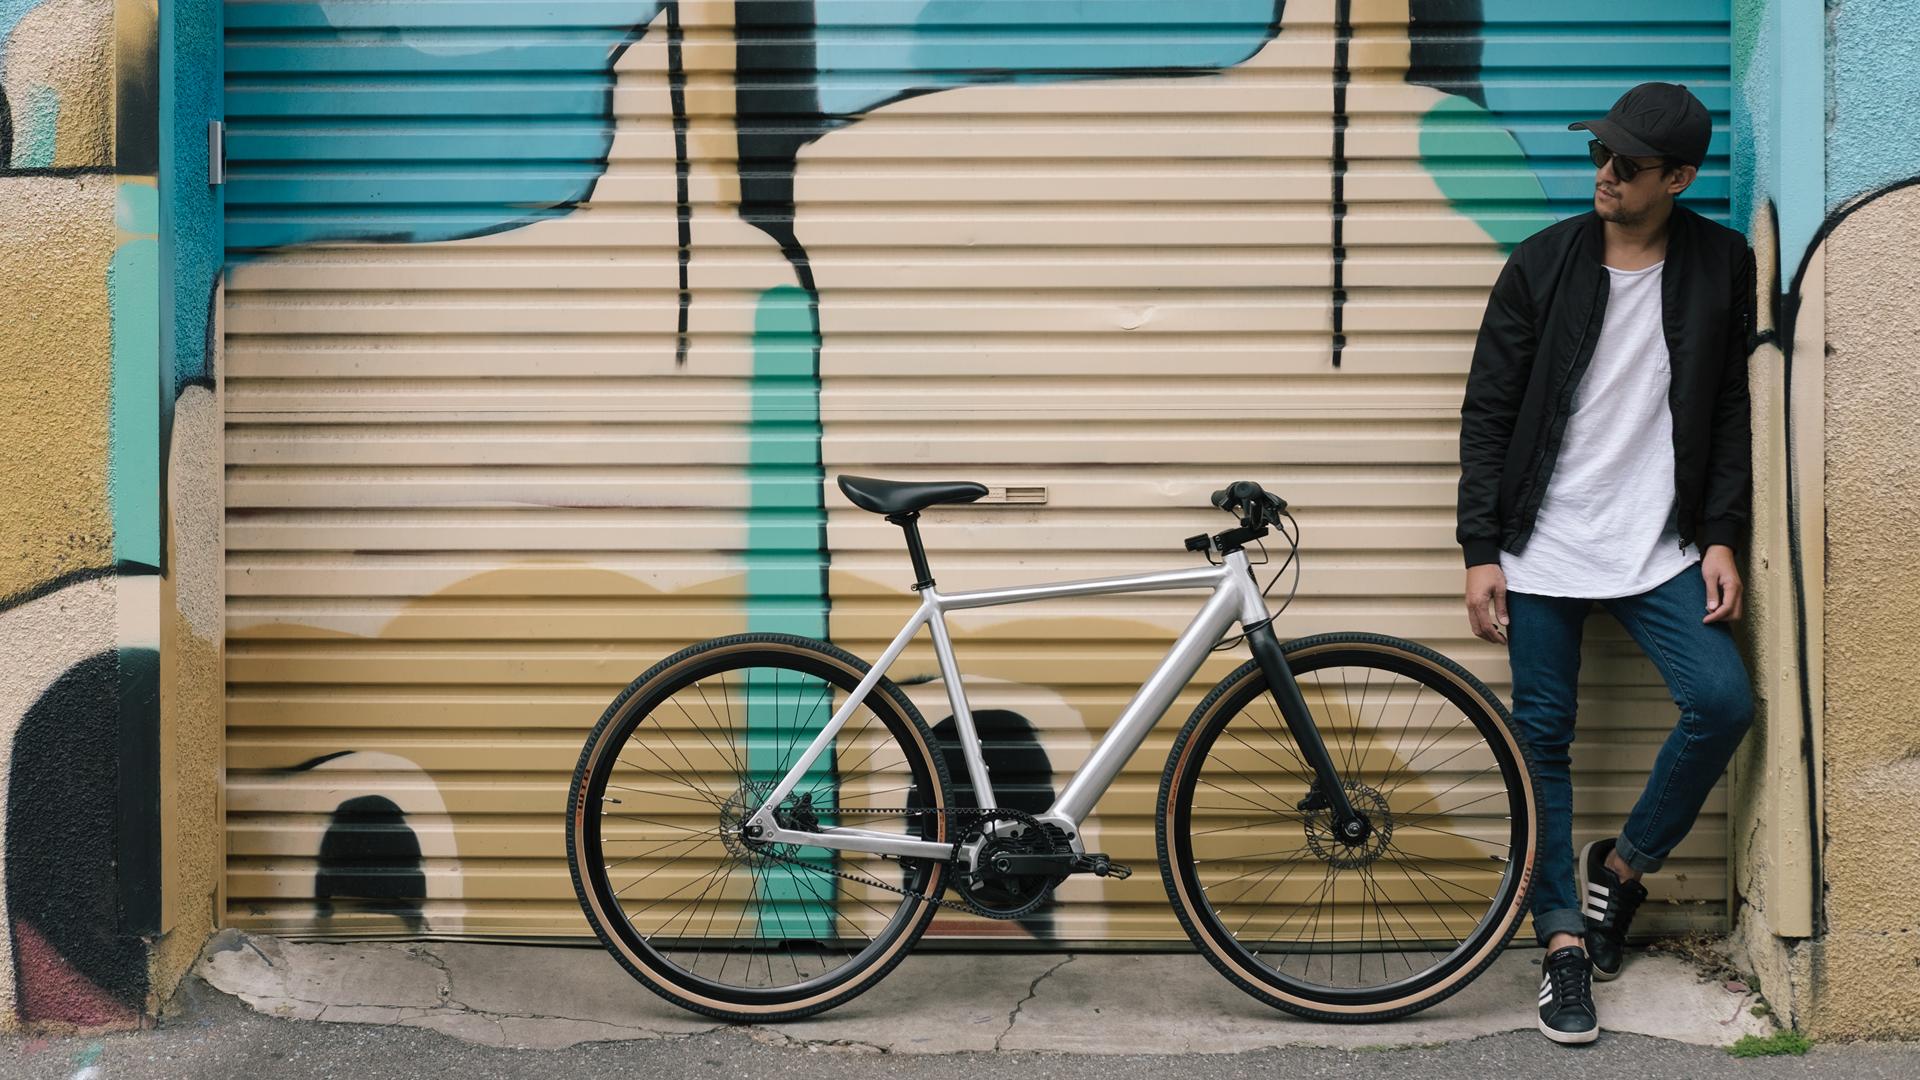 Enki looks to bring joy to boring commutes with Miller e-bike